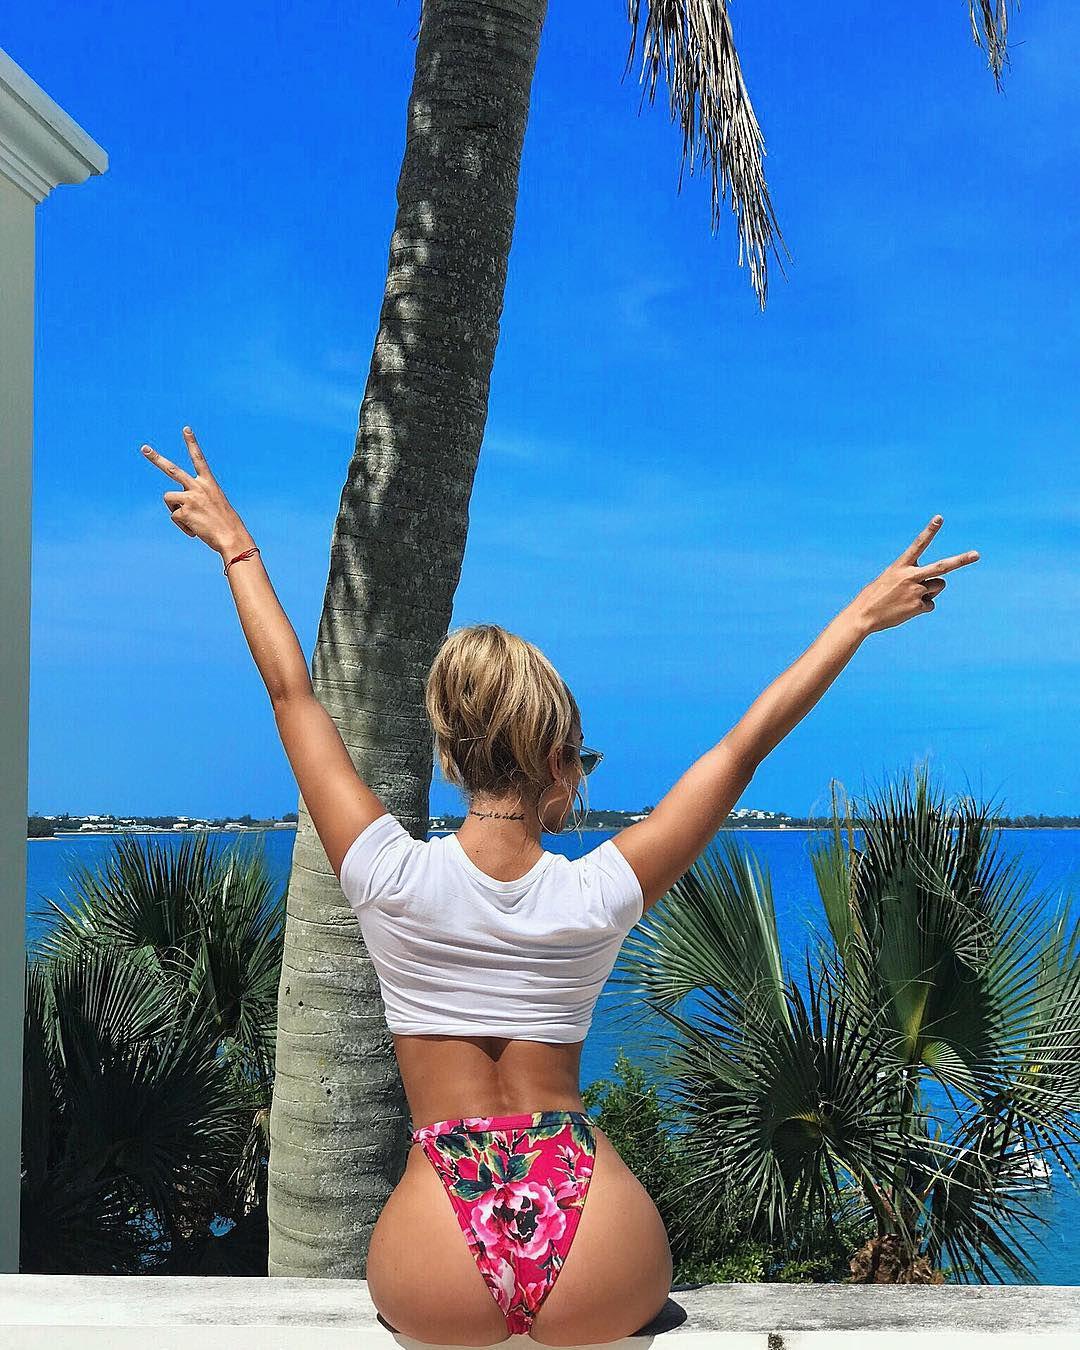 Jasmine-Sanders-in-bikinis-during-Revolve-Summer-Event-in-Bermuda-b6qm2x4ike.jpg